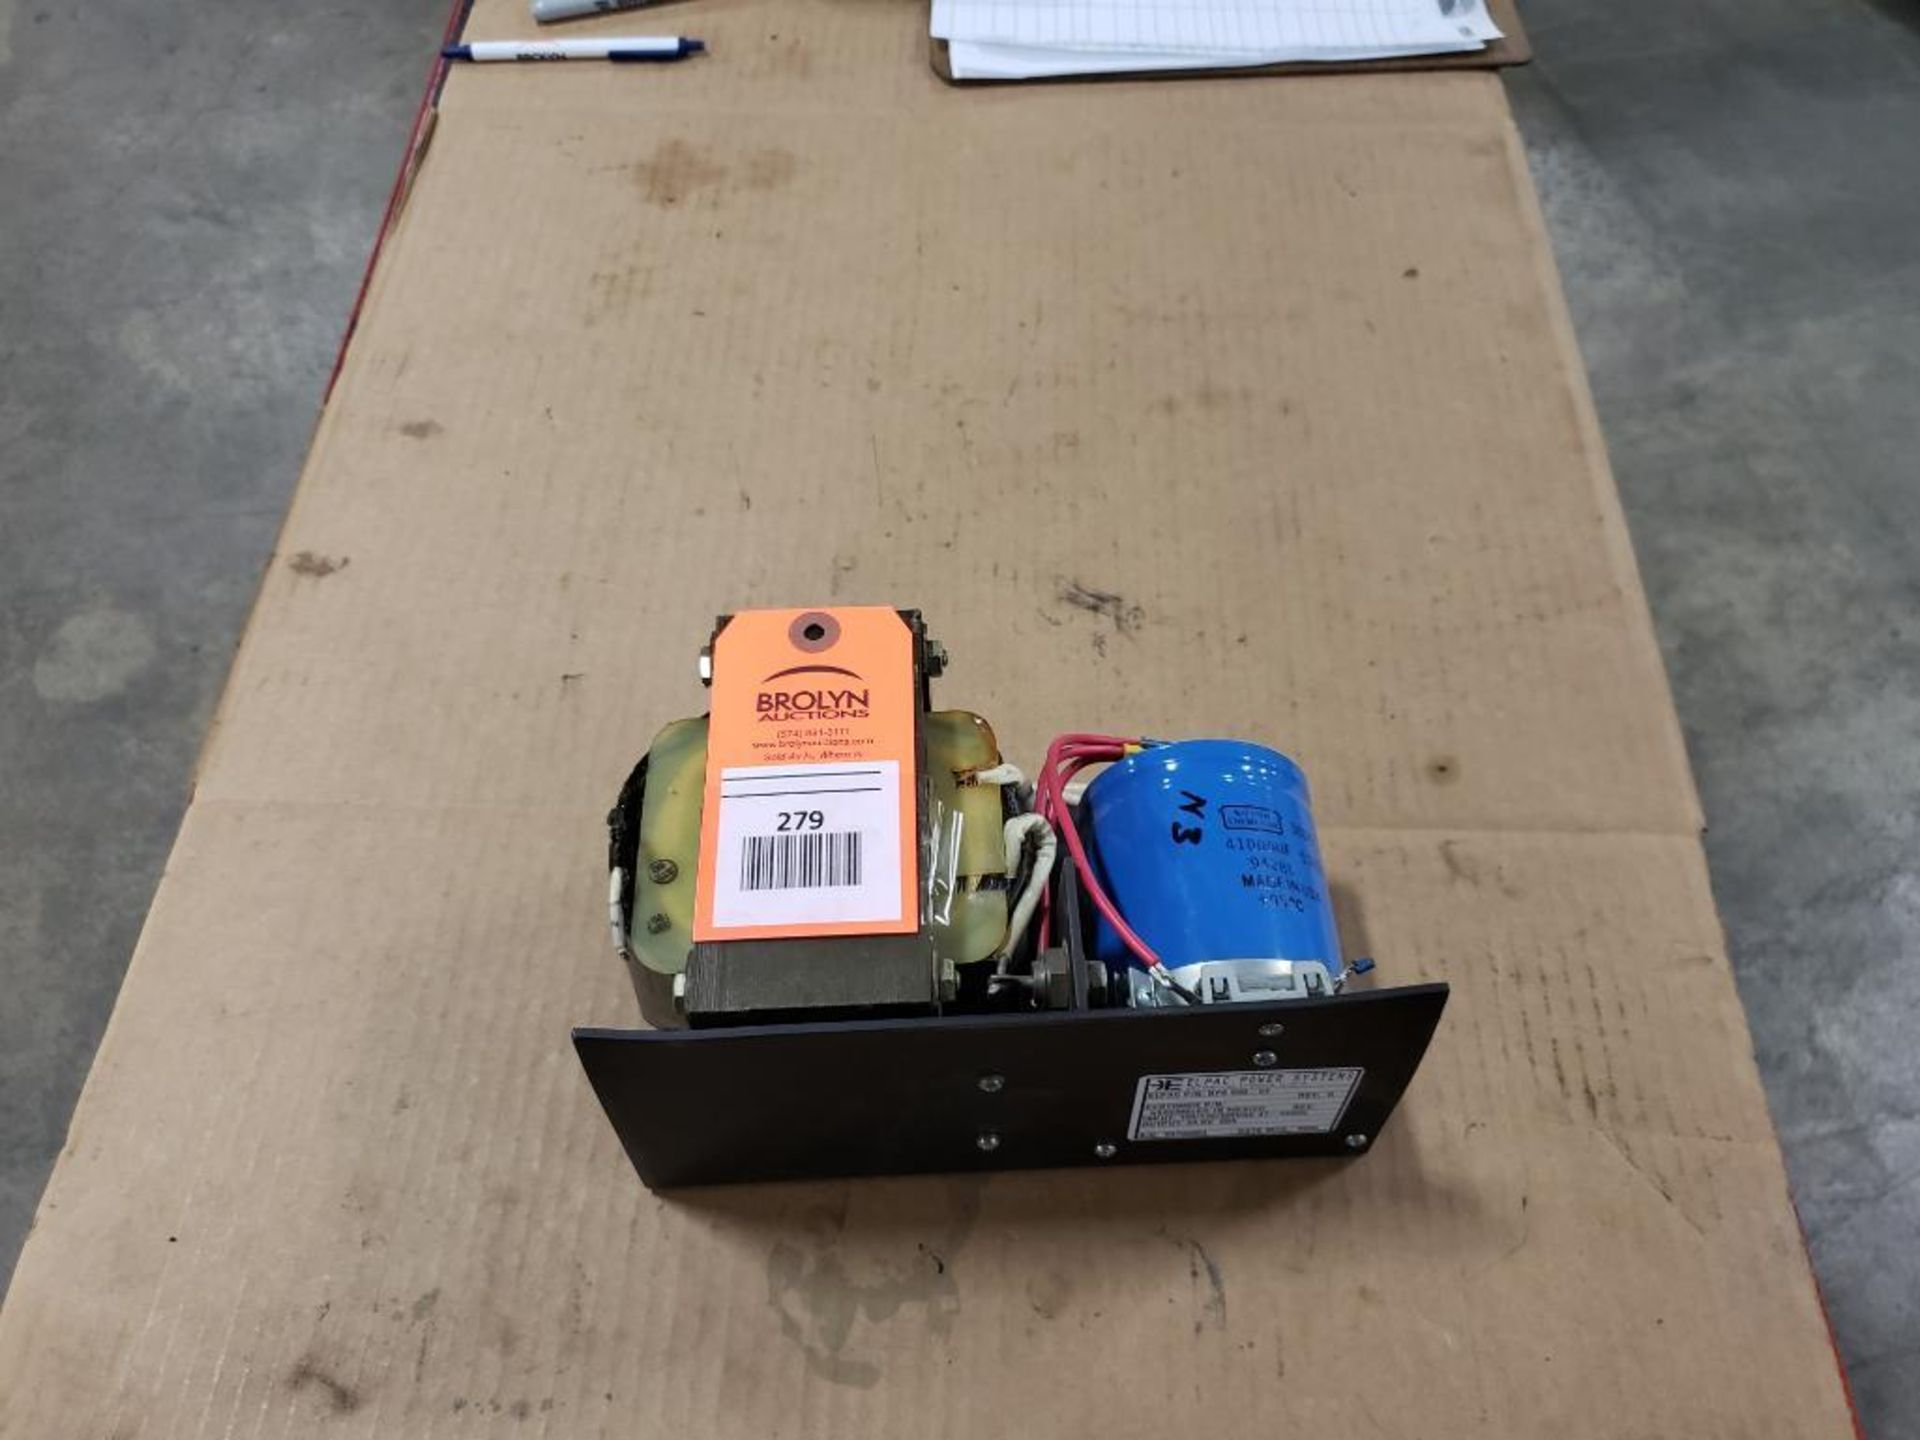 Elpac Power Systems BFS500-24 Power supply.